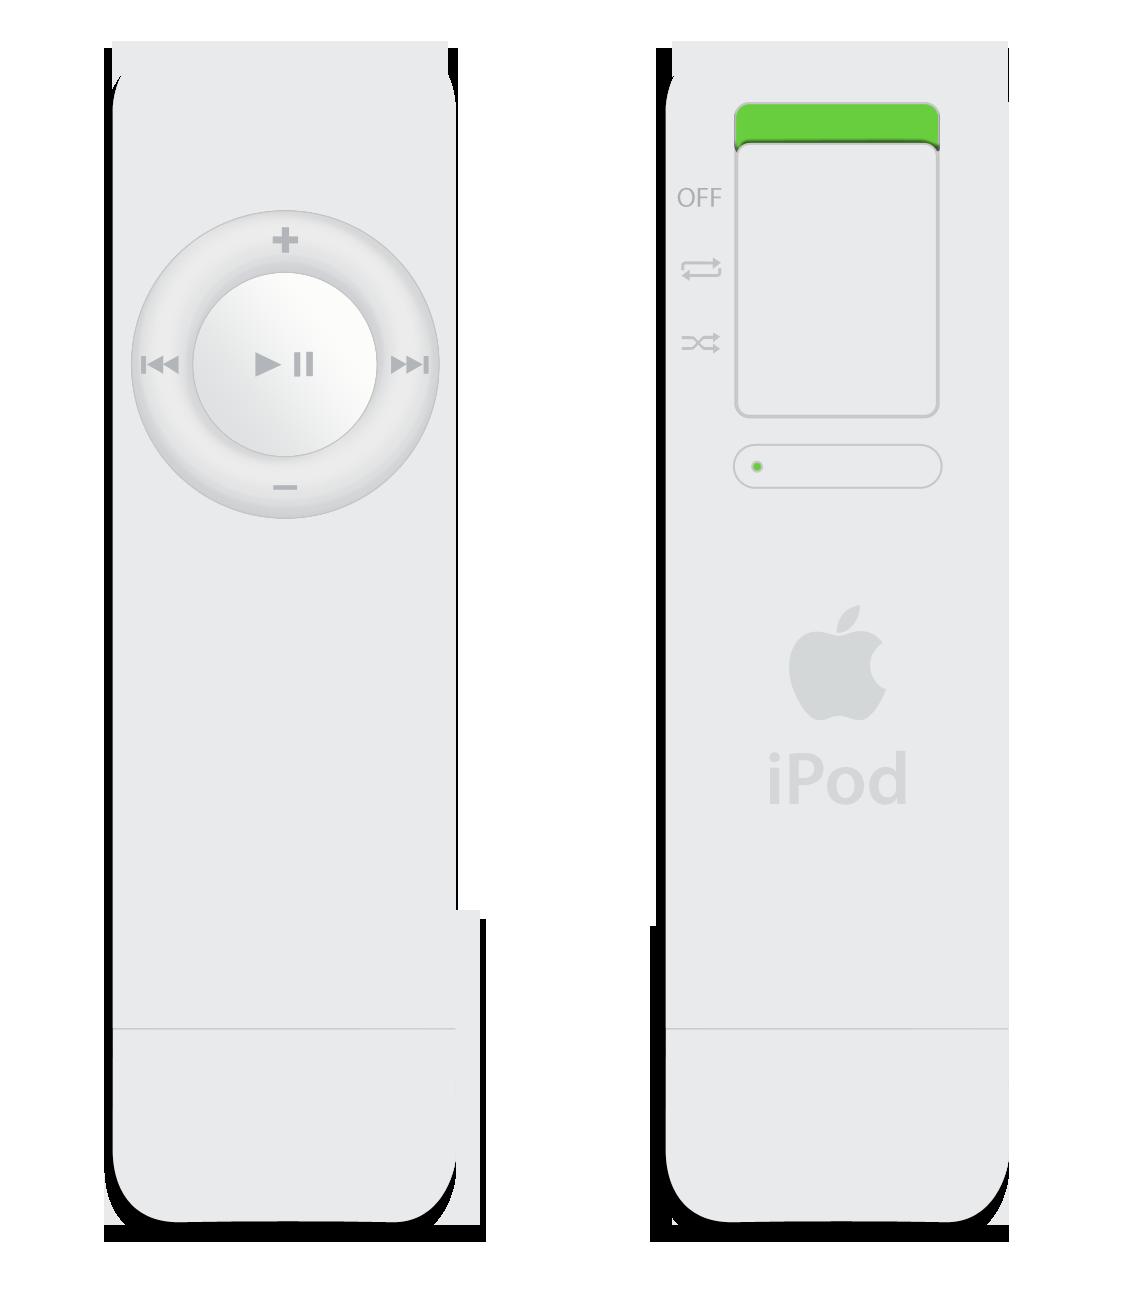 Apple iPod Shuffle. 1st Generation. 2005.